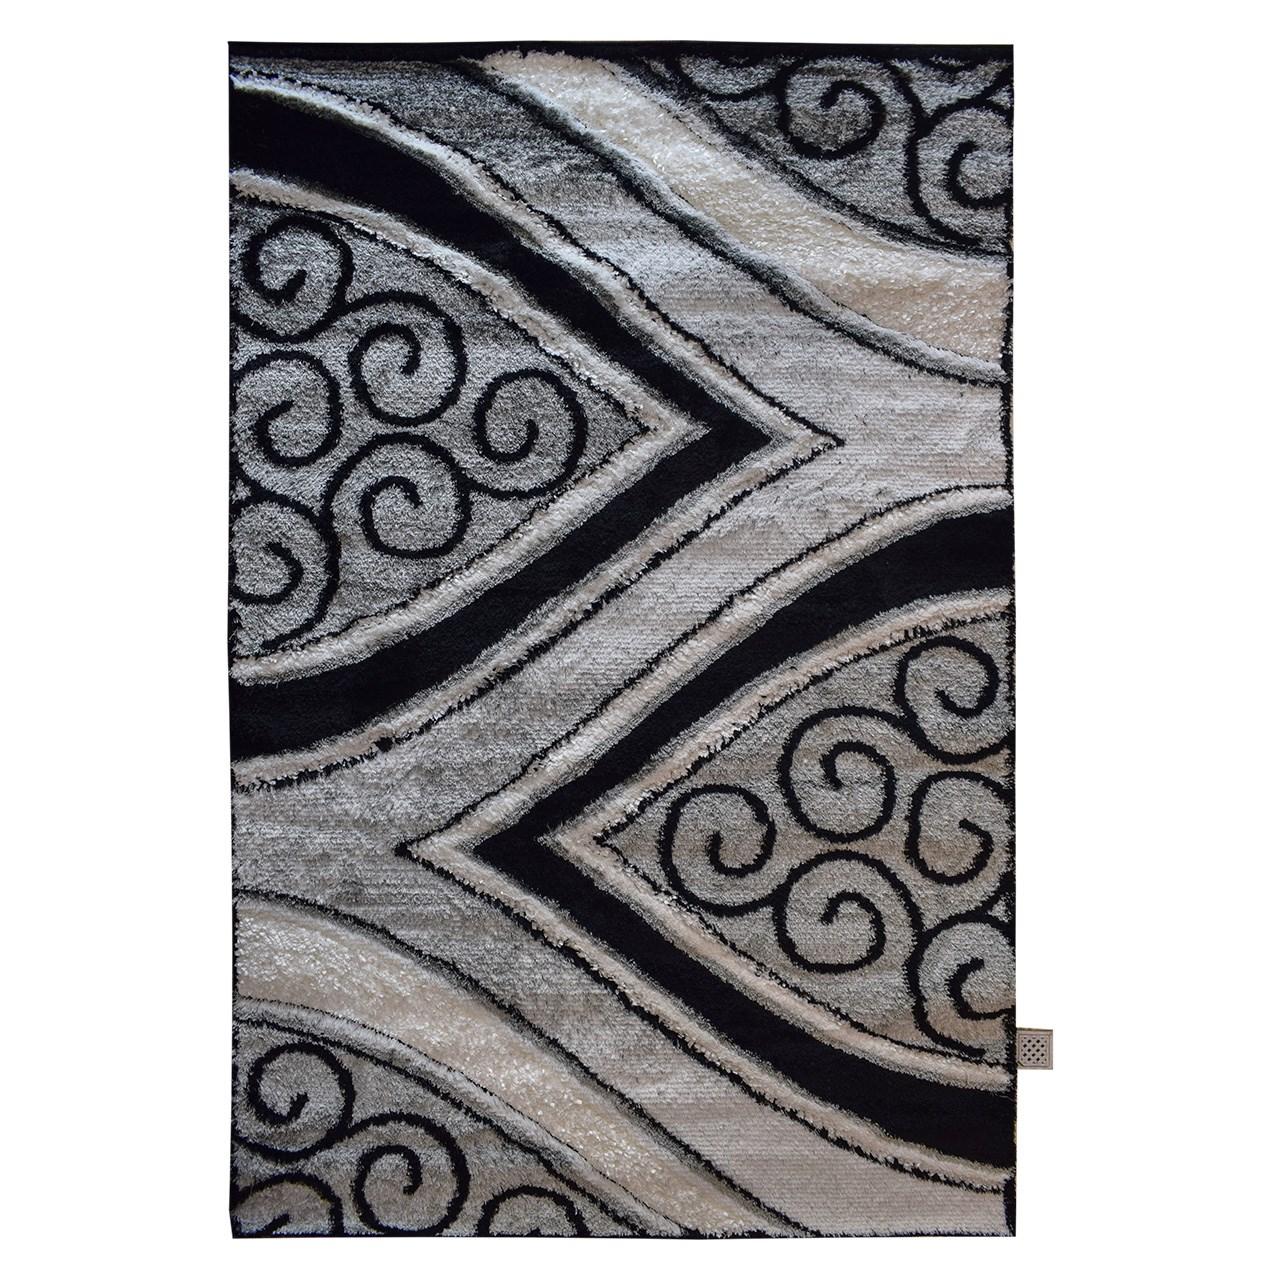 فرش ماشینی پاتریس طرح شگی کد 0126  زمینه الوان